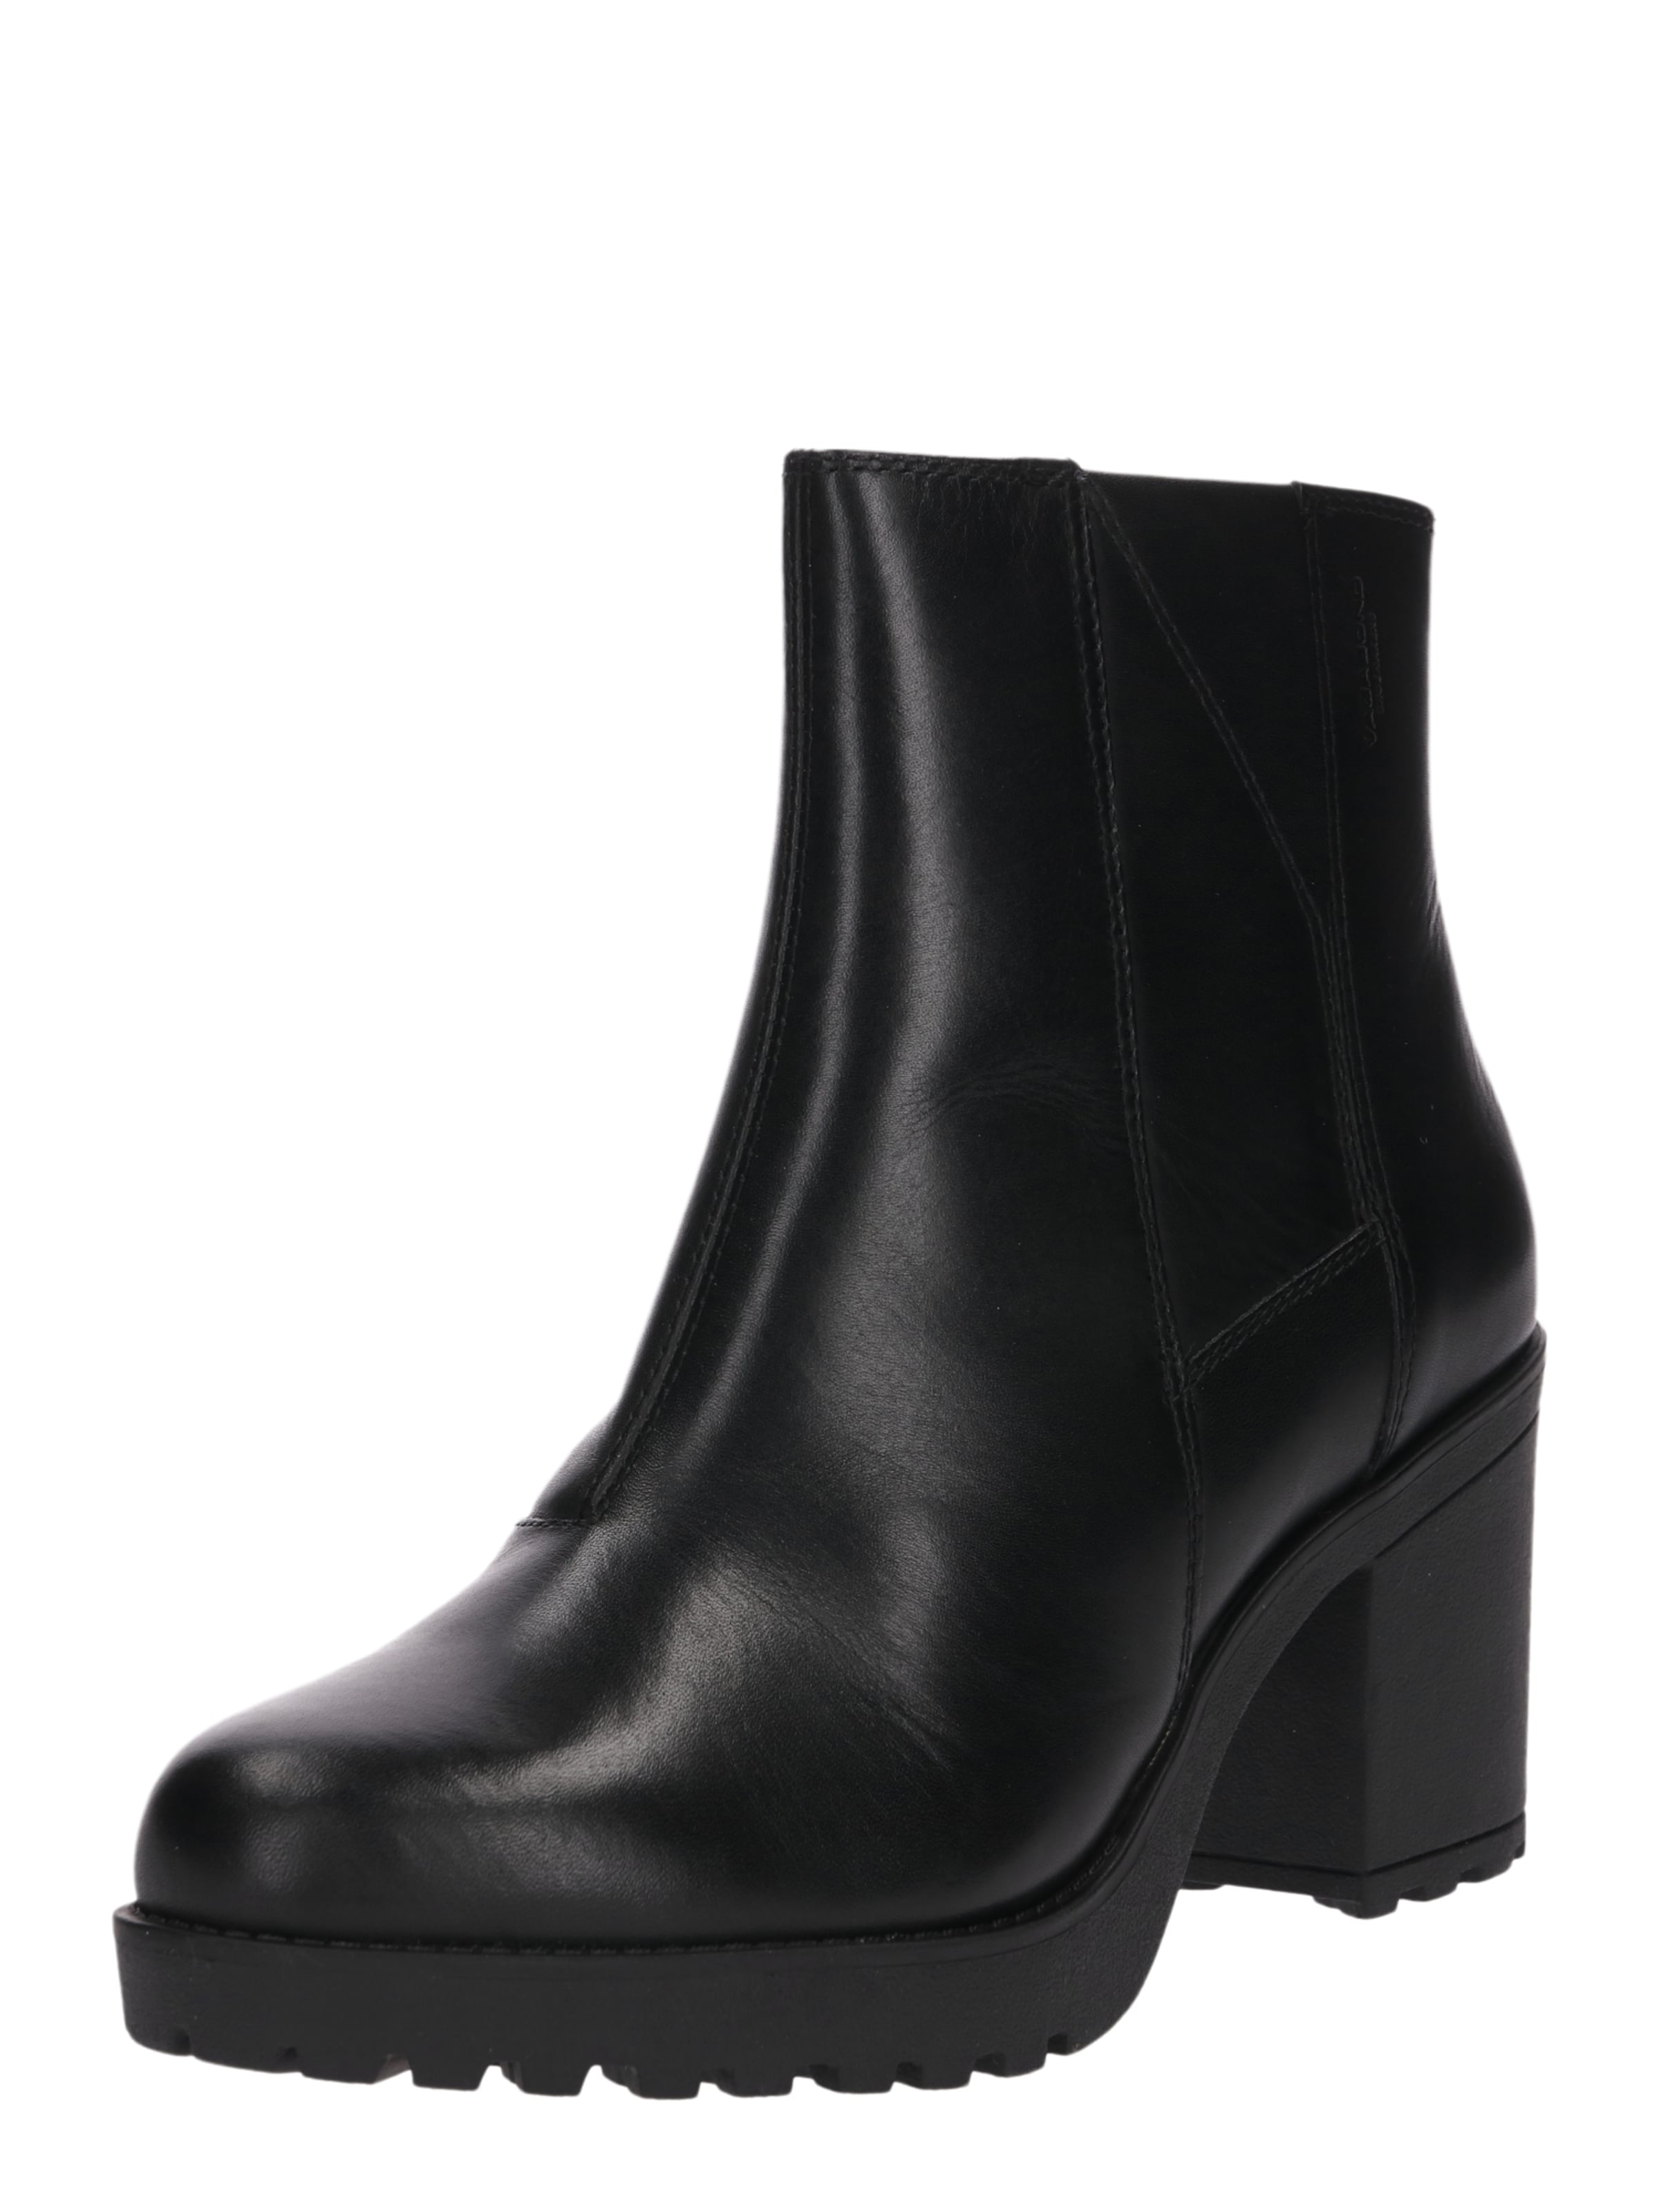 Vagabond Stiefelette In Shoemakers Schwarz 'grace' vny80OmNw